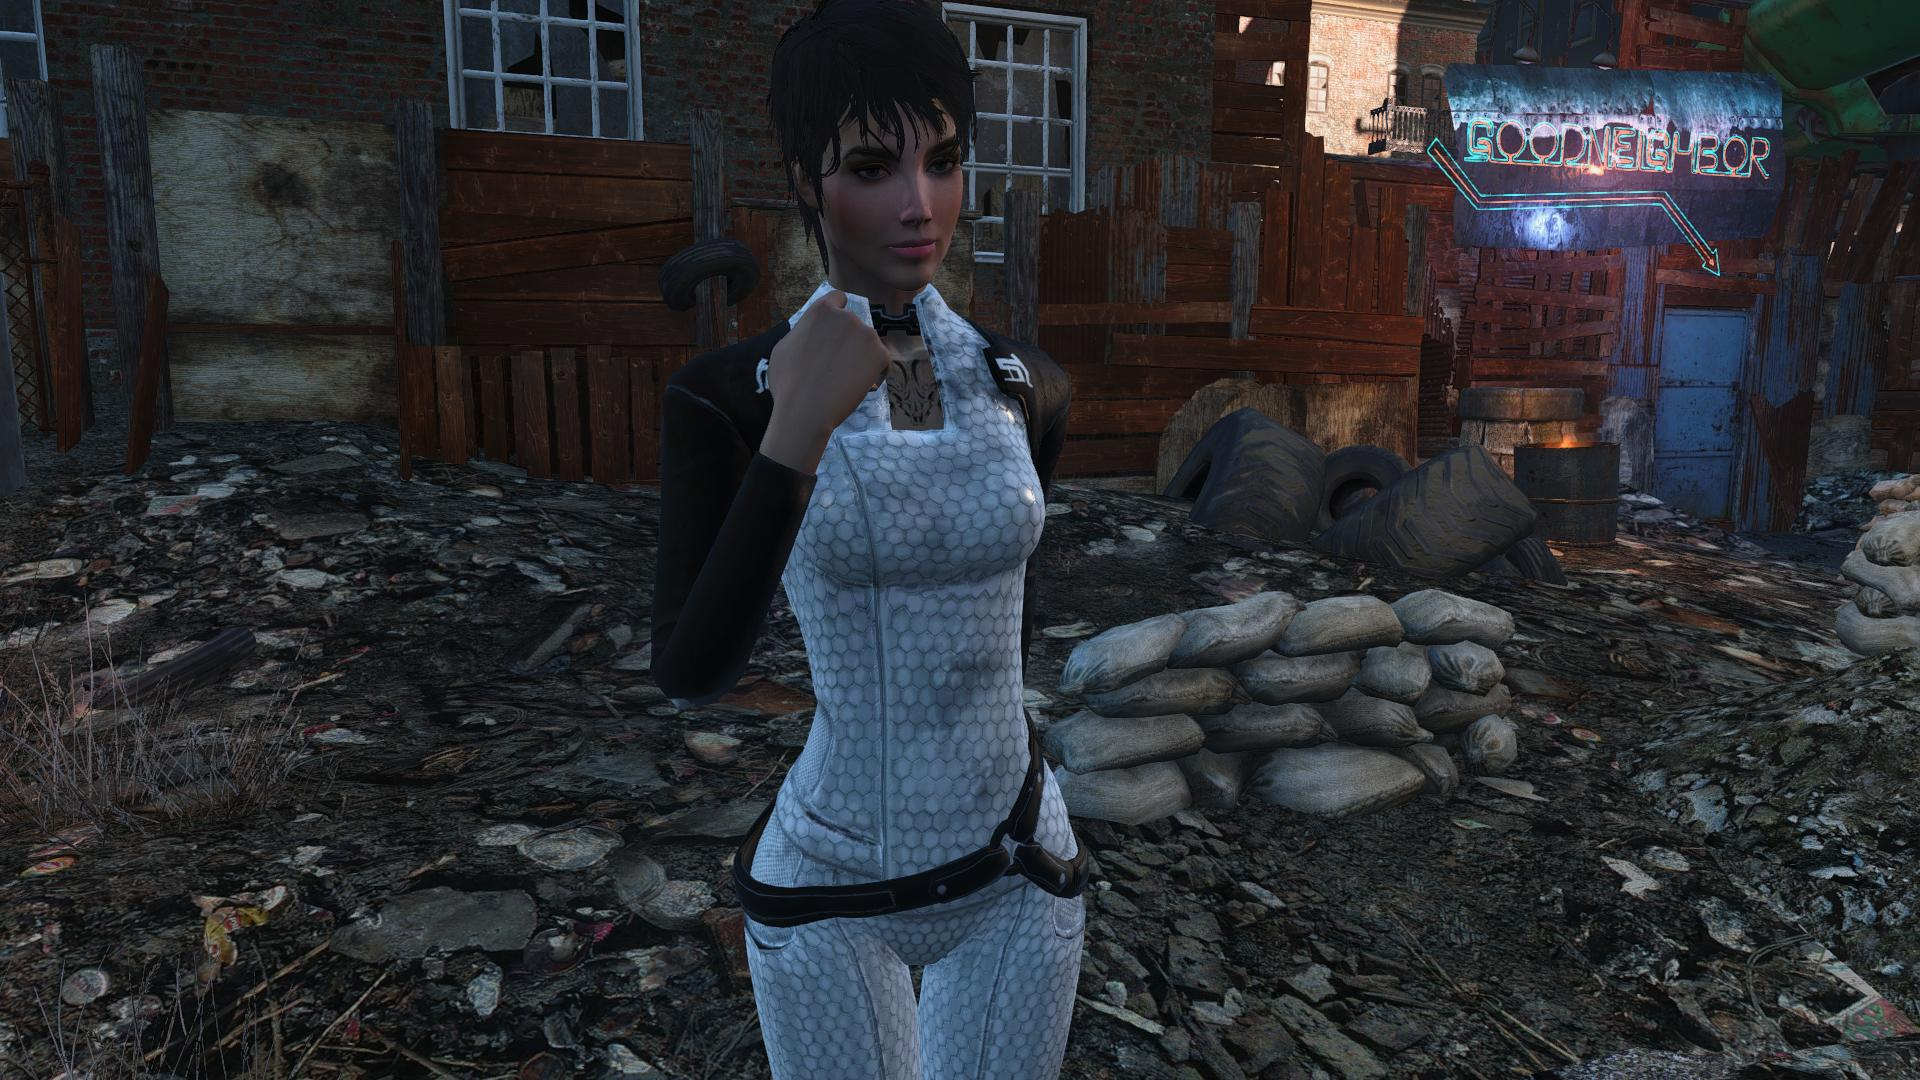 000491.Jpg - Fallout 4